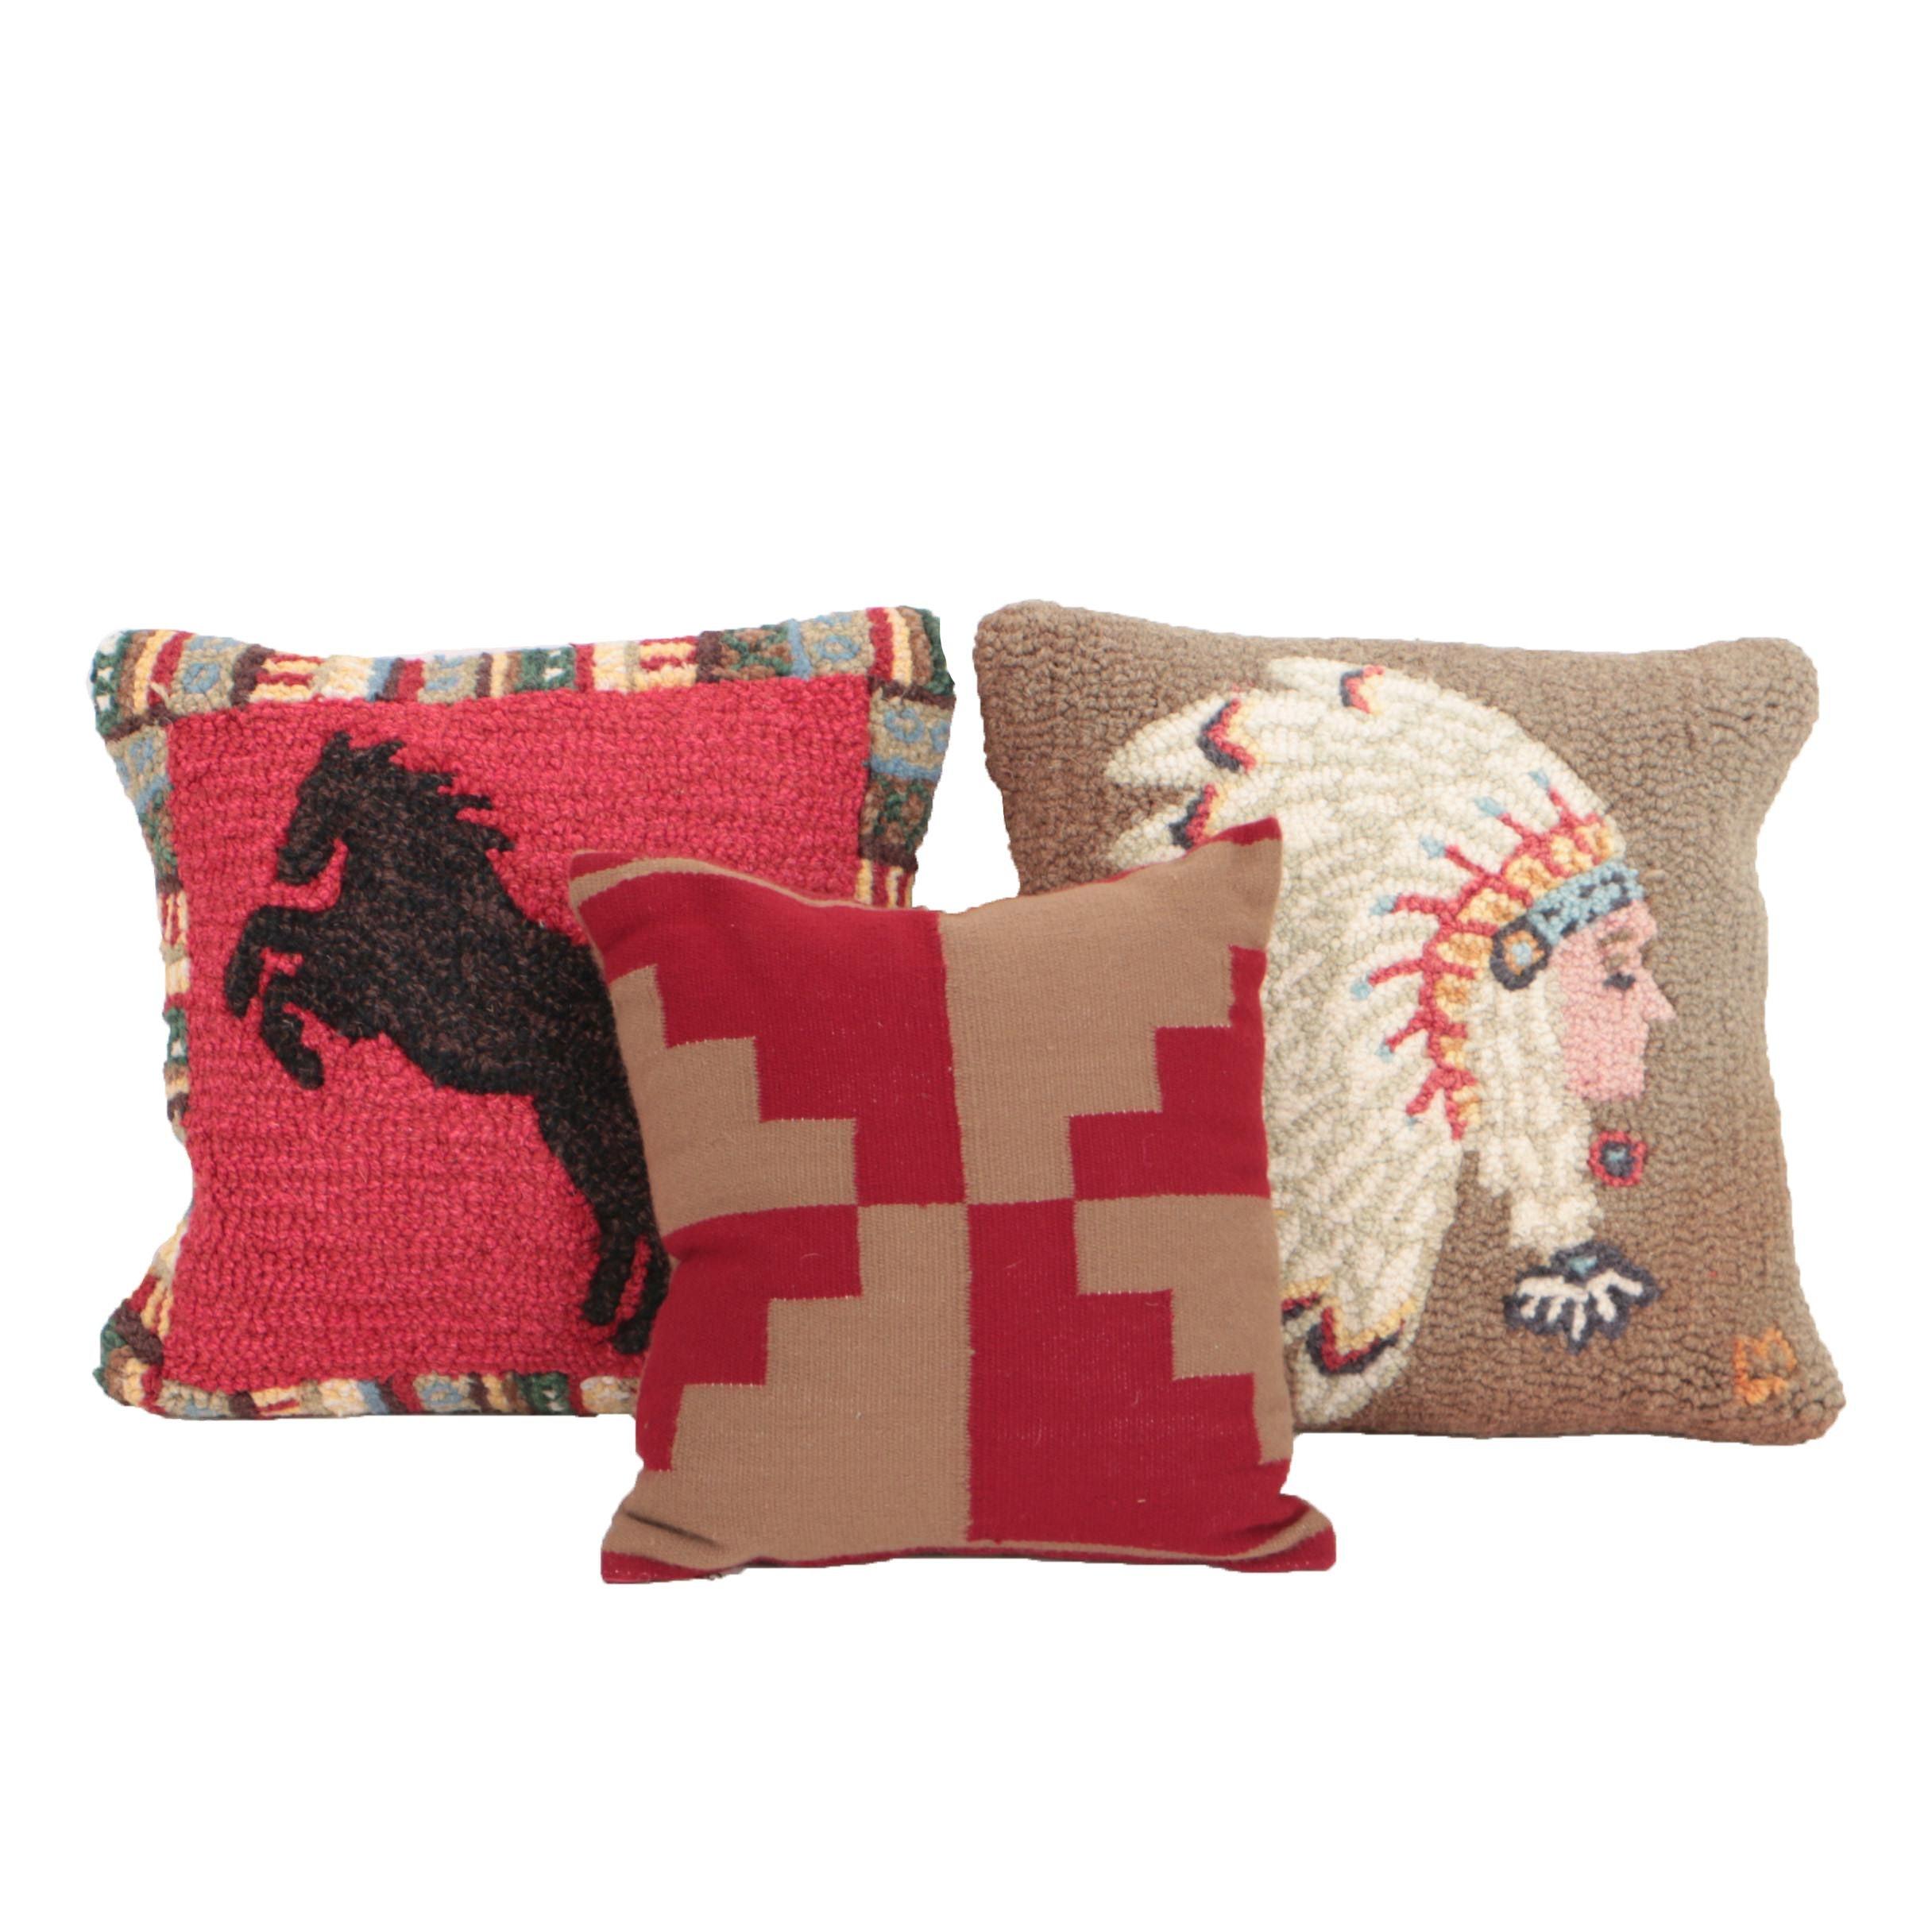 Chandler 4 Corners Hand Hooked Pillows and Peruvian Pillow